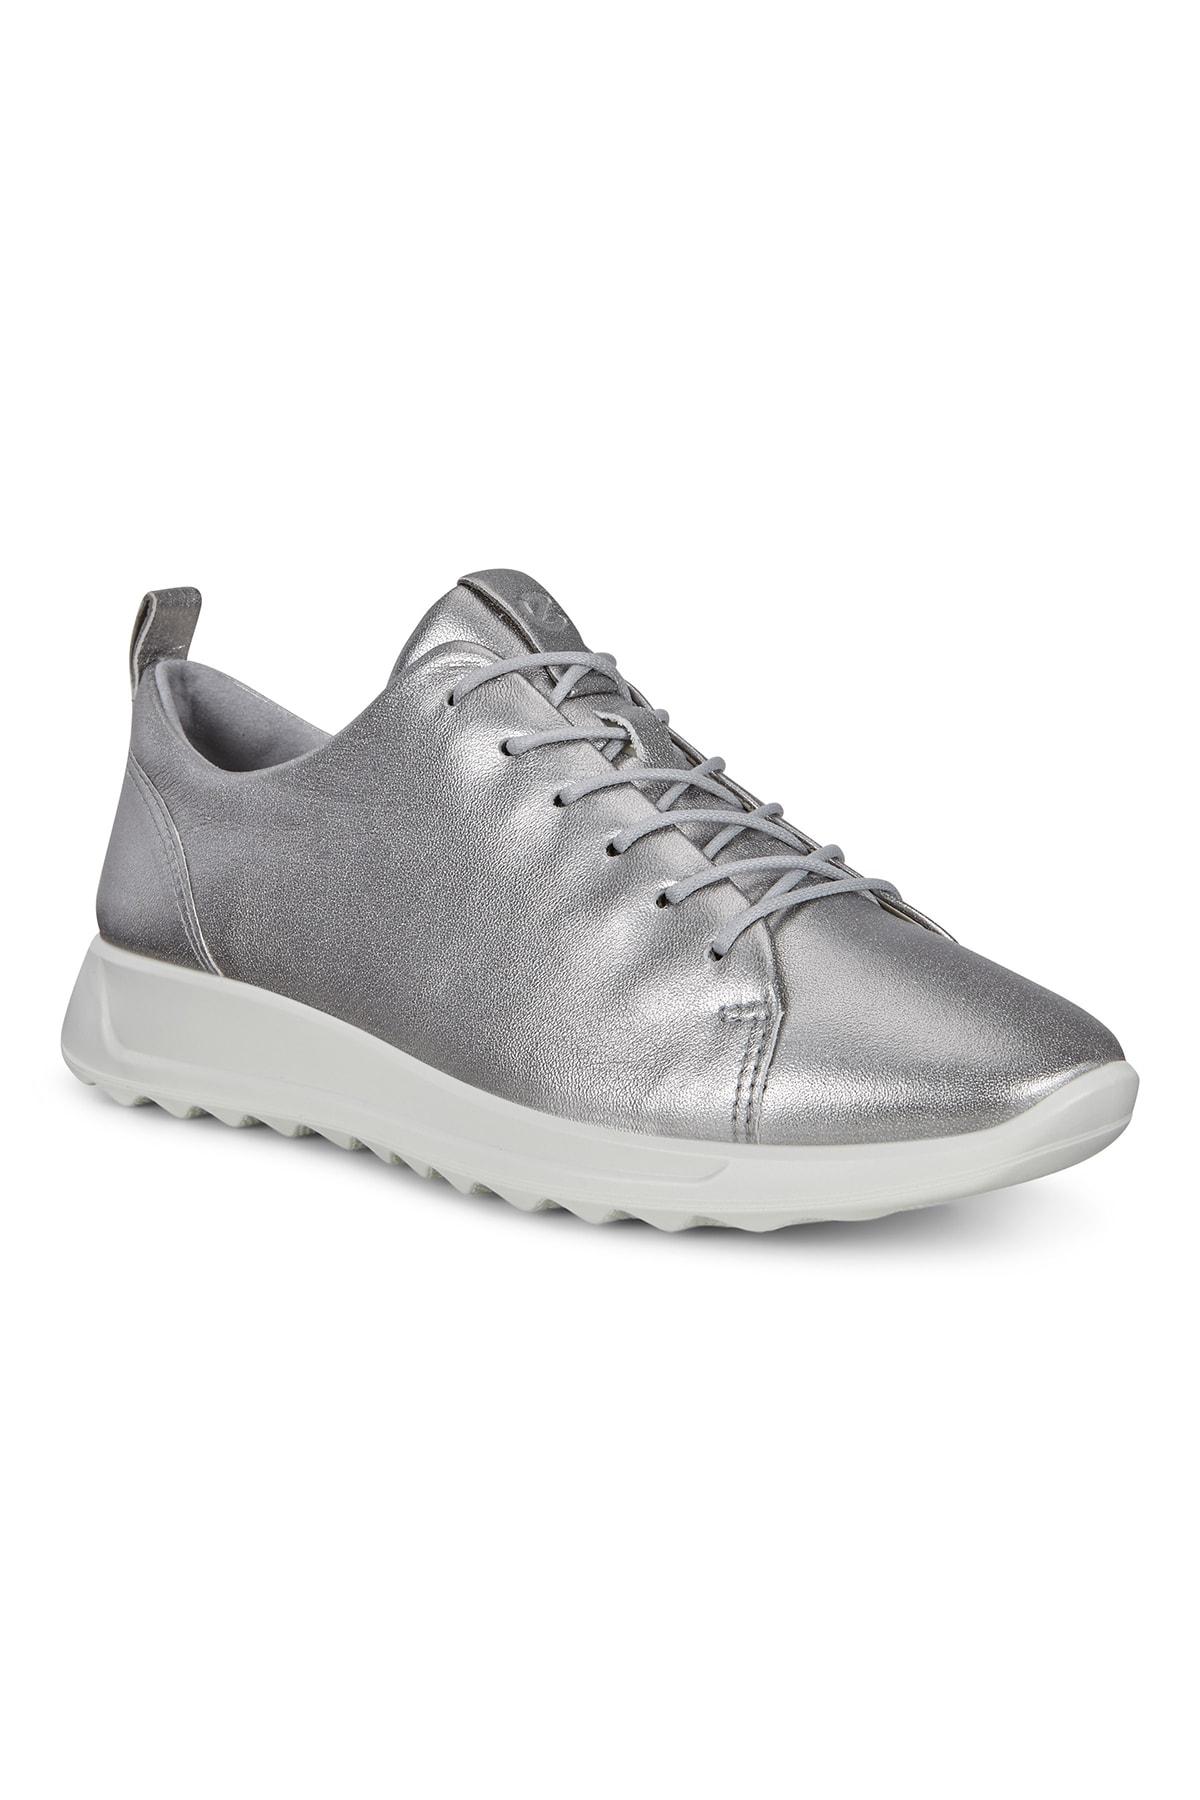 Ecco Kadın Sneaker Flexure Runner W Alusilver Gumus 292303